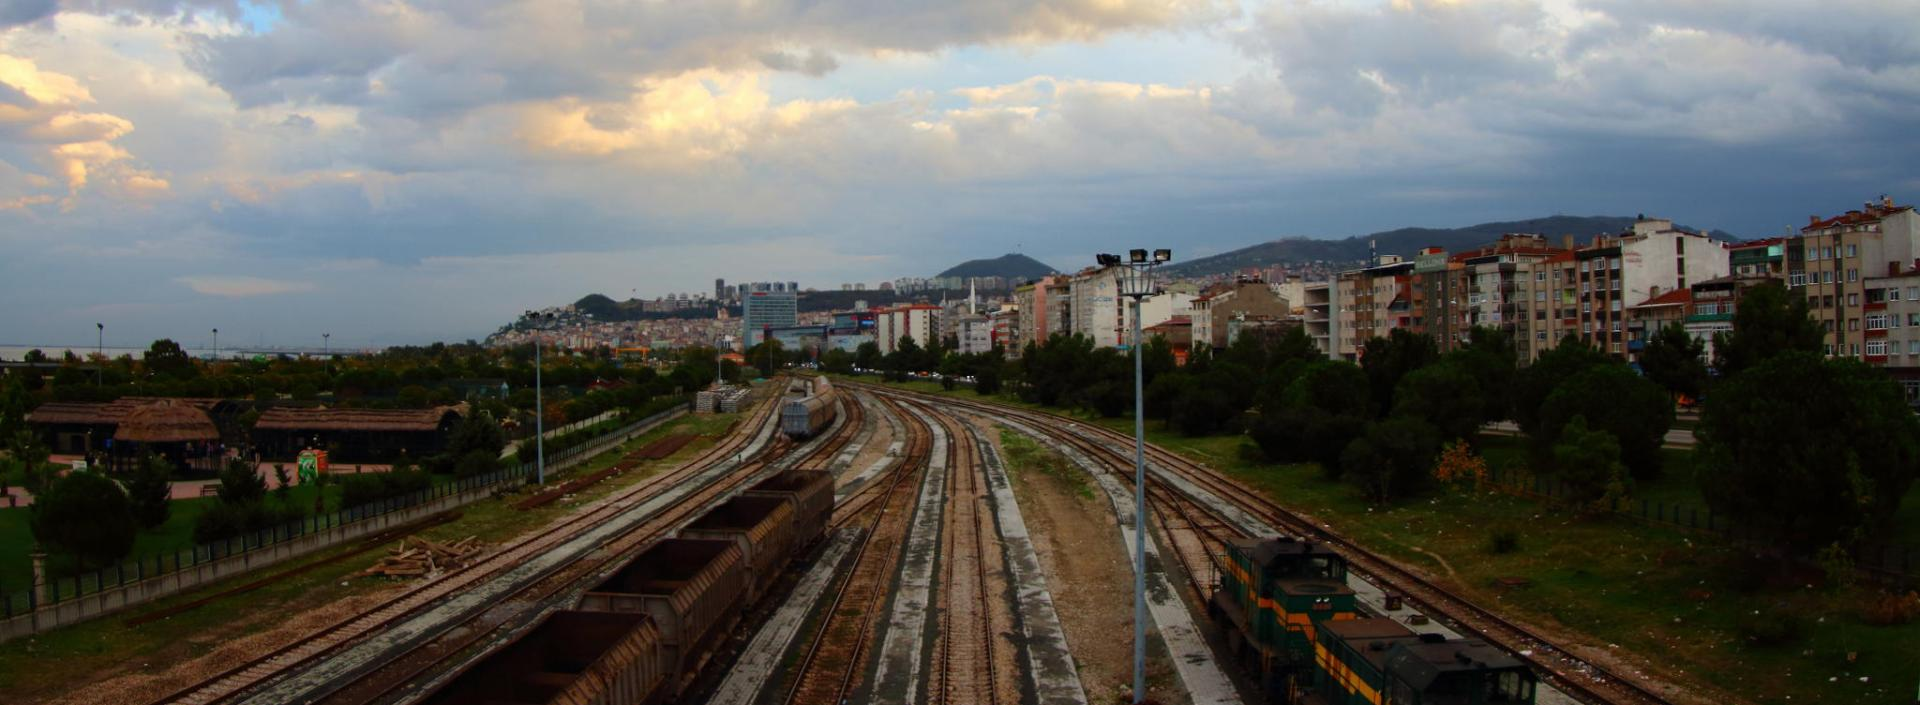 Modernización de la Línea Ferroviaria Samsun - Kalin